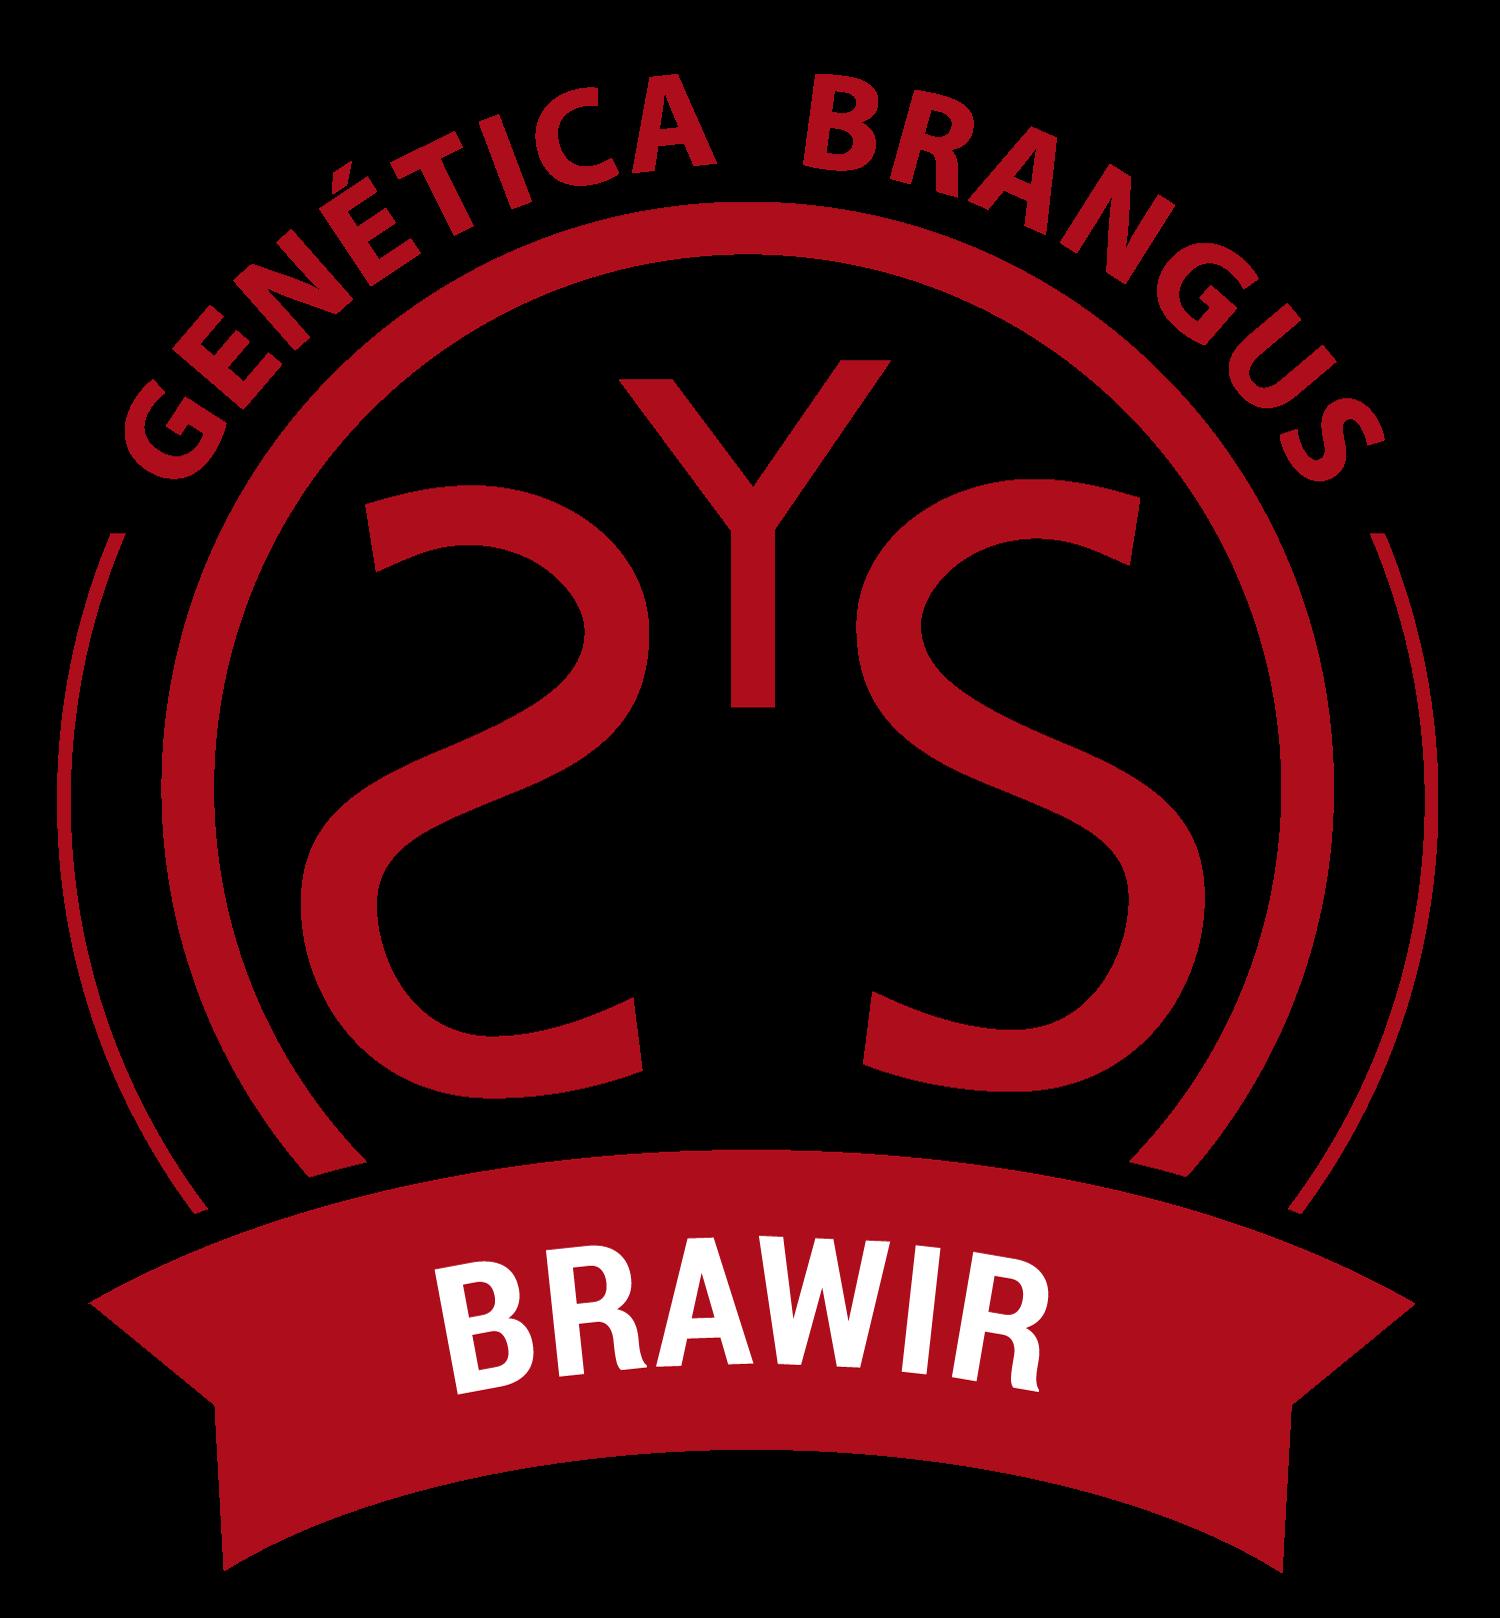 Brawir Genética Brangus!